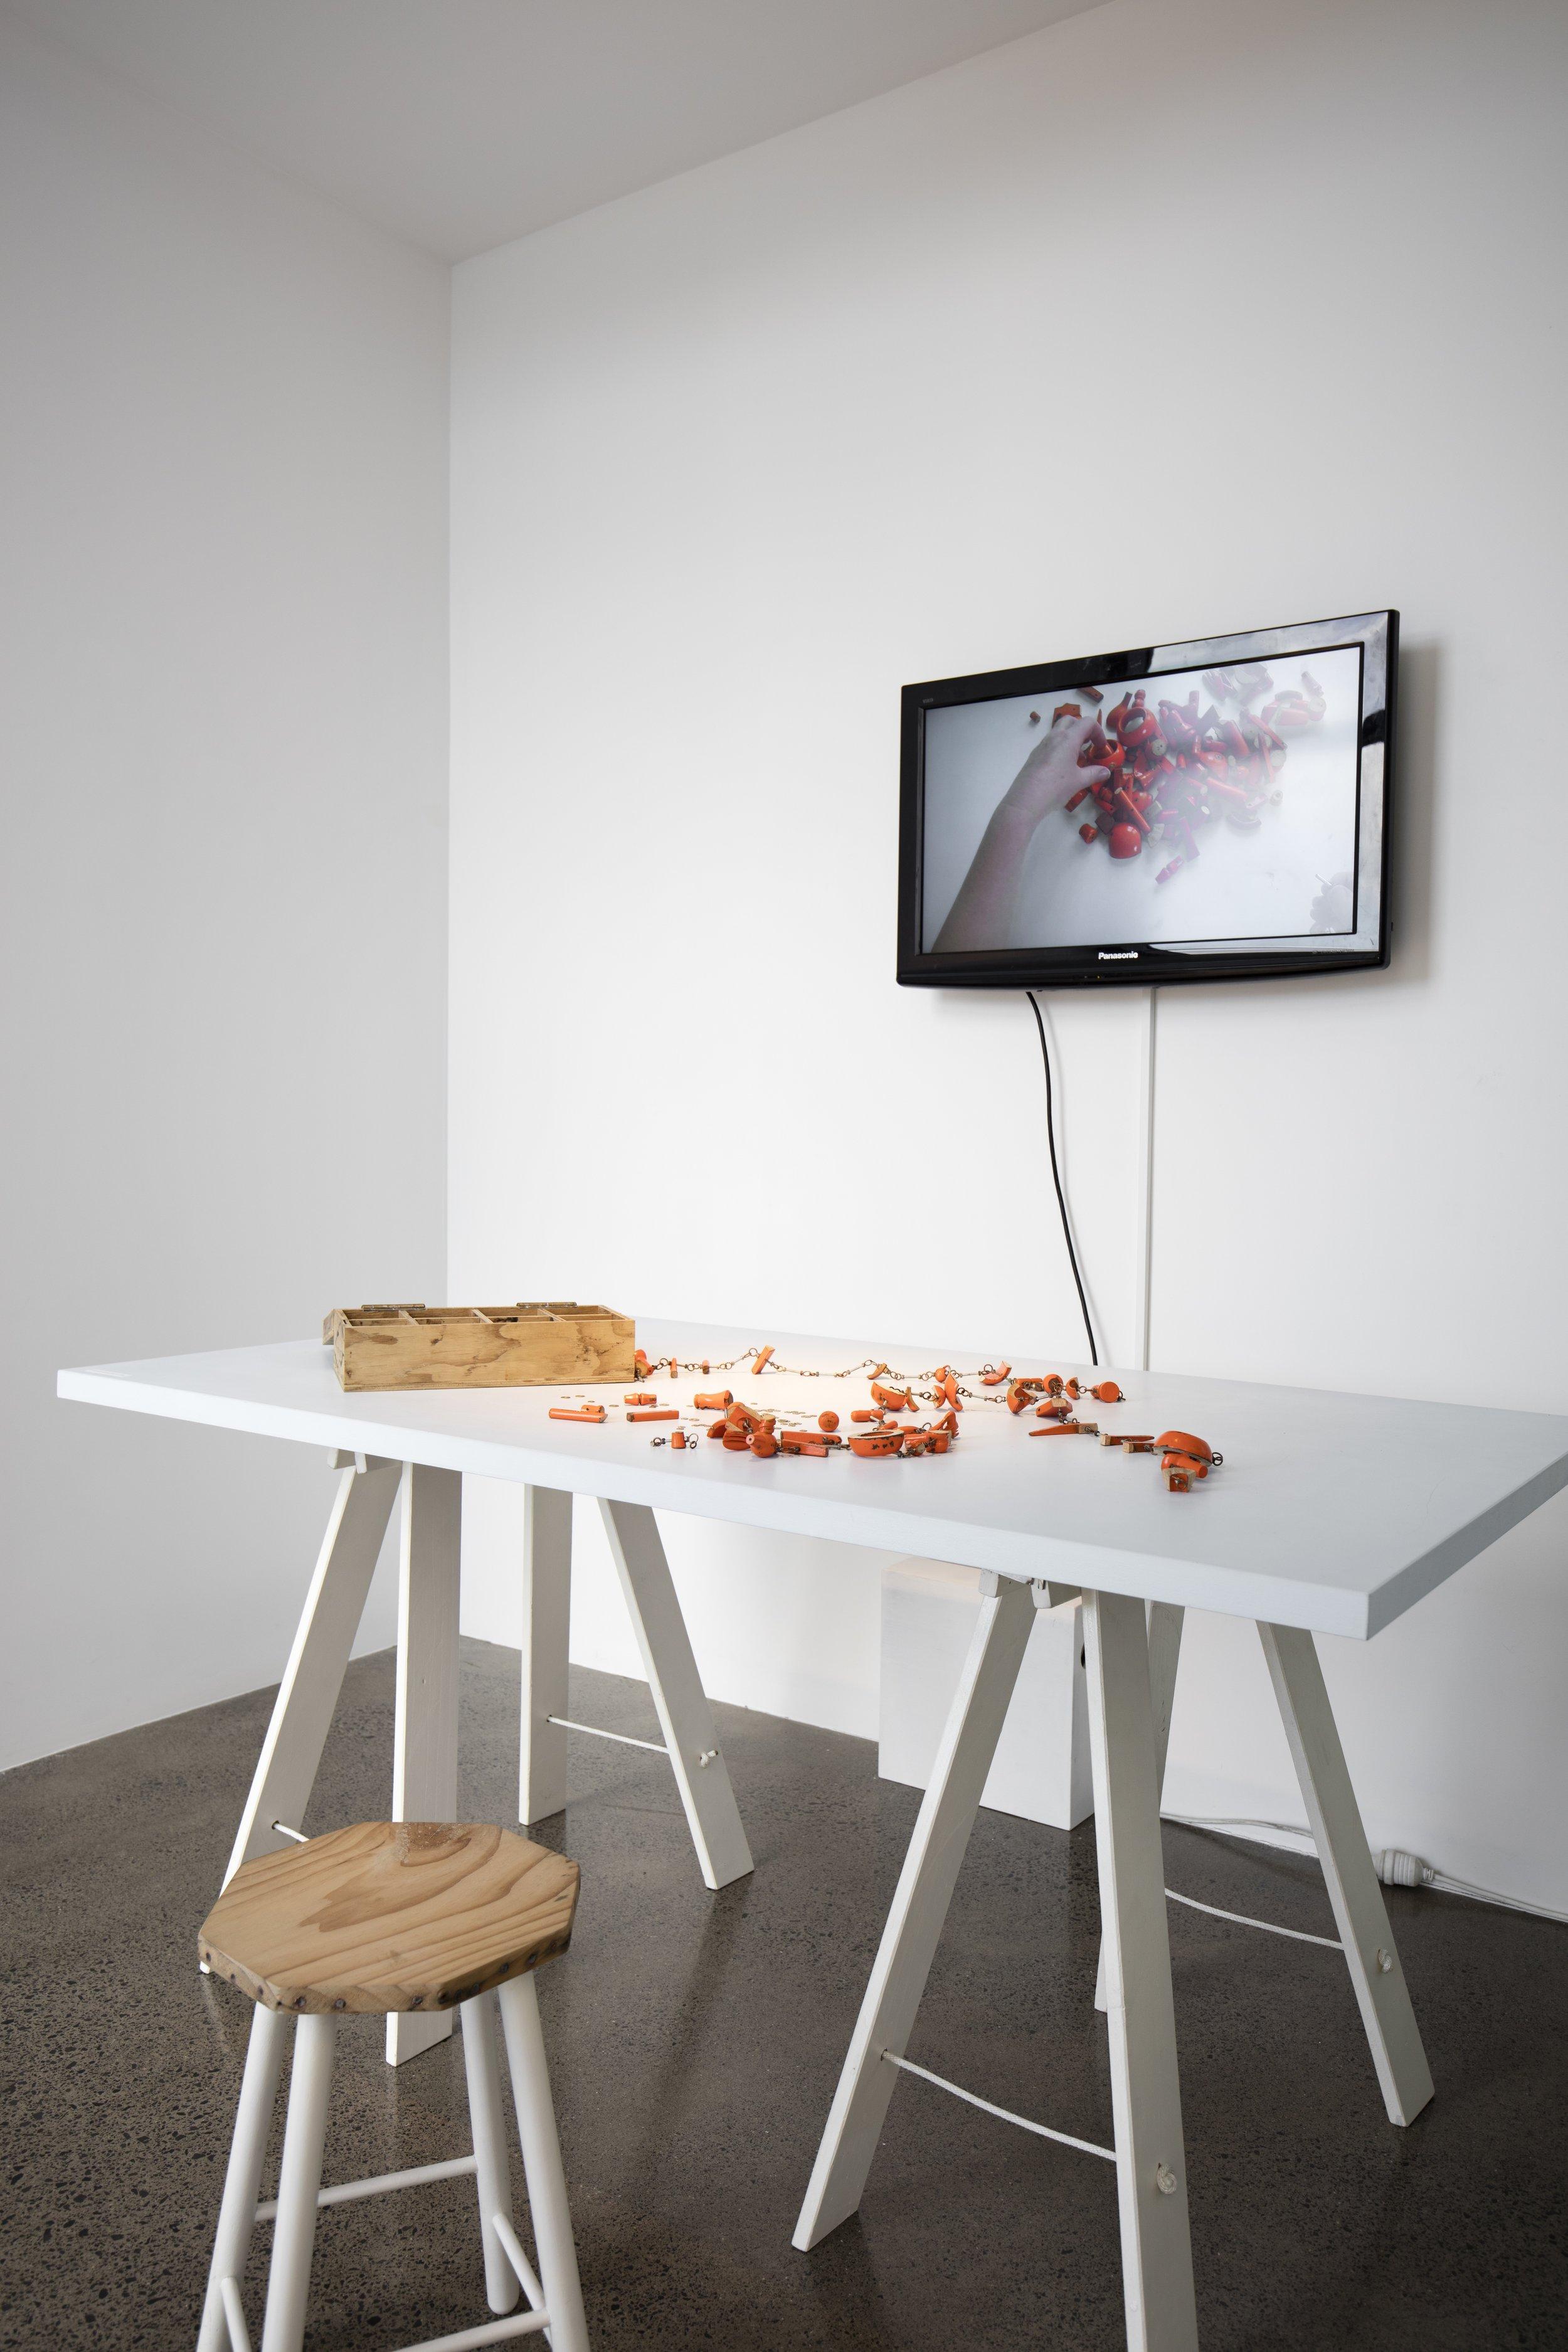 Sarah Walker Holt,  Kitset , 2014. Wood, acrylic paint, copper, brass, nuts and bolts, plywood box, digital video (5.39 mins), trestle table, stool. Courtesy of the artist and Te Uru Waitākere Contemporary Gallery. Photo: Sam Hartnett.